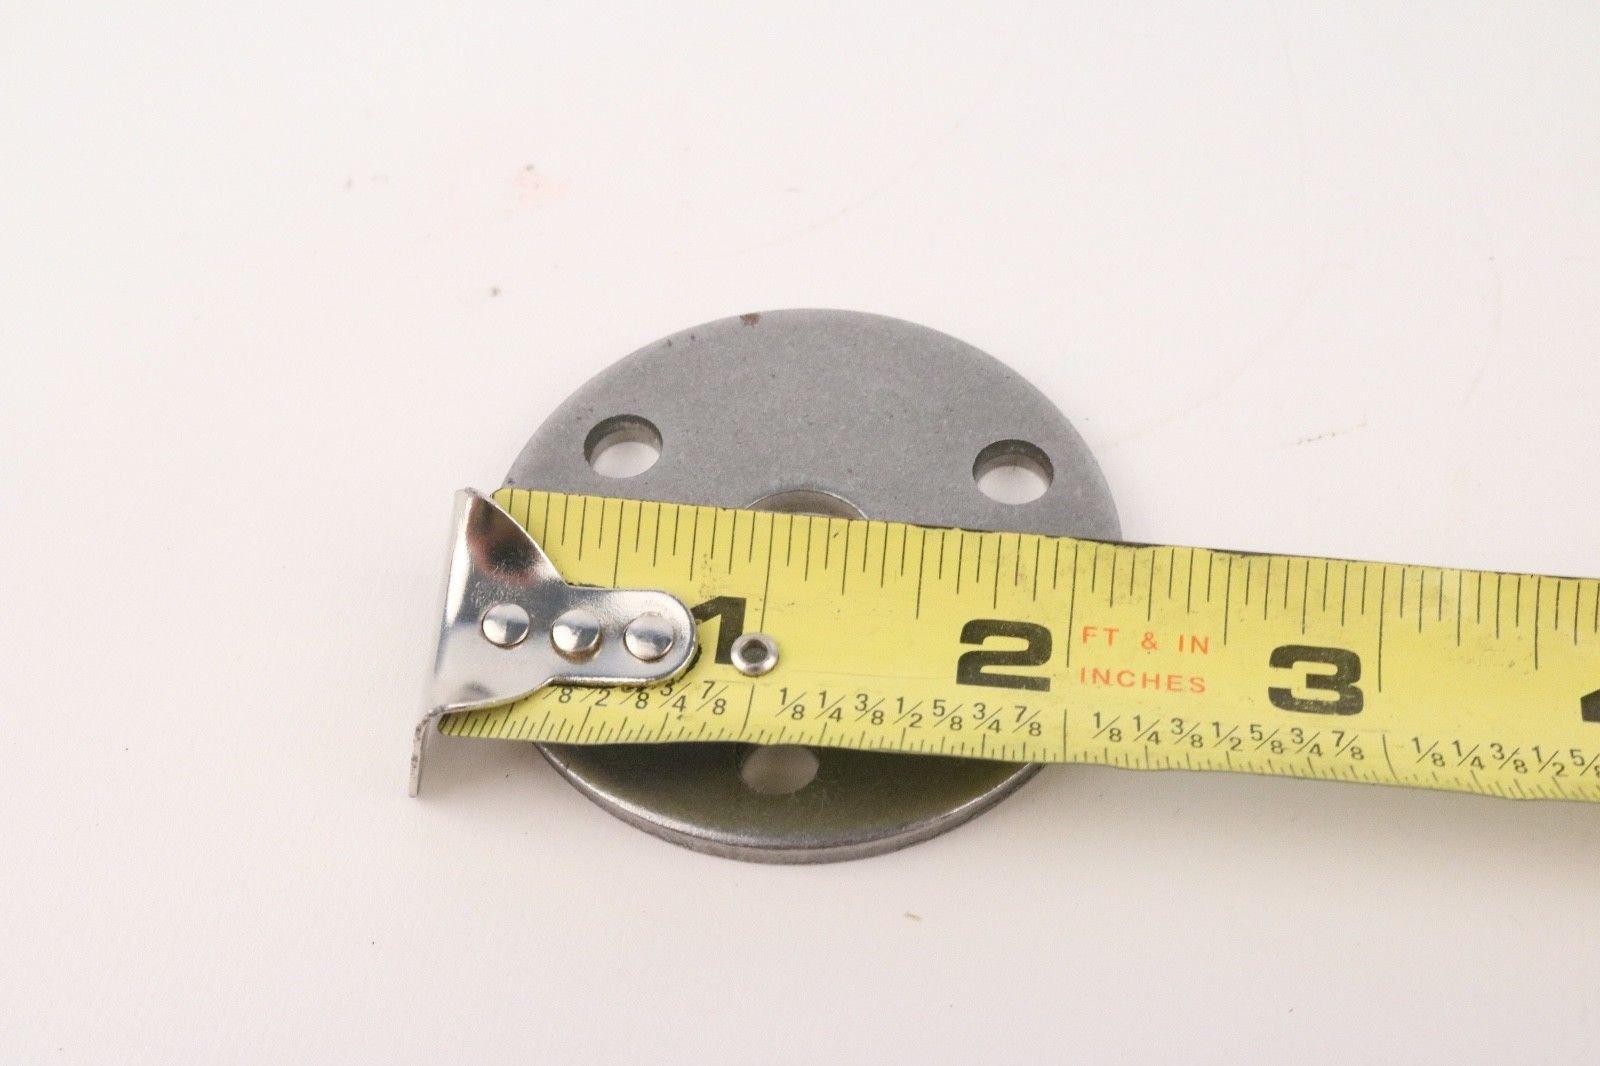 Steering Wheel Mount 3 Hole Weldment Shaft Bracket Go Kart by Unknown (Image #3)